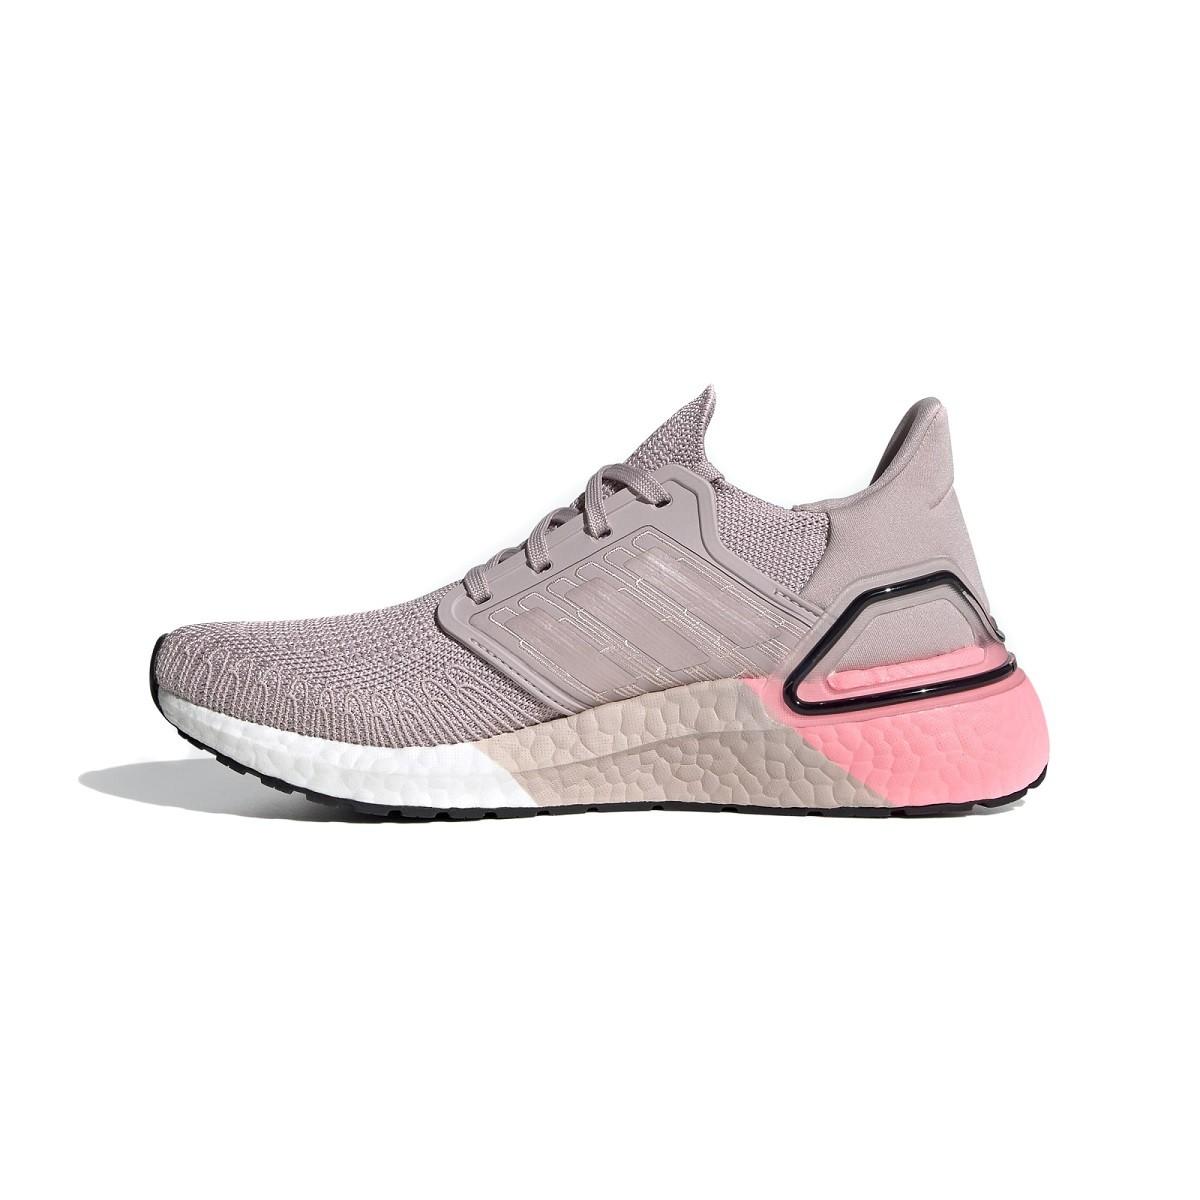 Tênis Adidas Ultraboost 20 Feminino Rosê